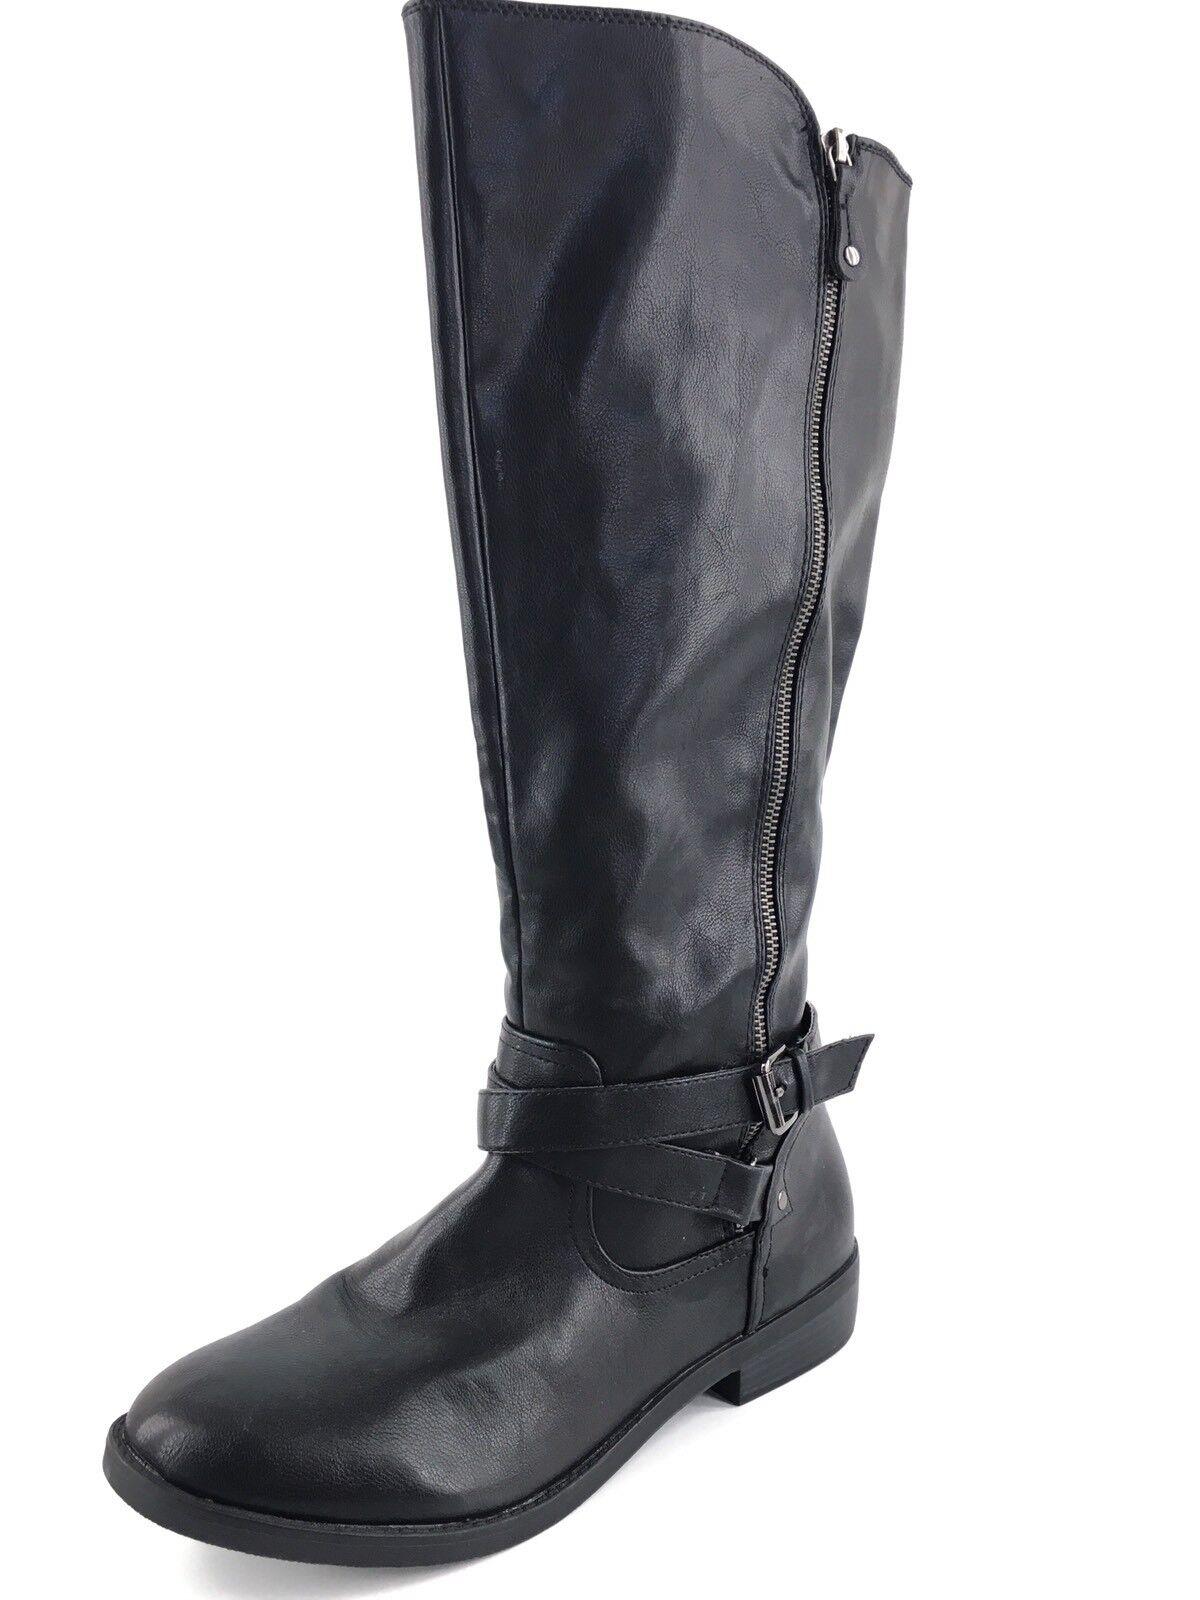 Report Harmoni Black Knee High Riding Boots Women's Size 11 M